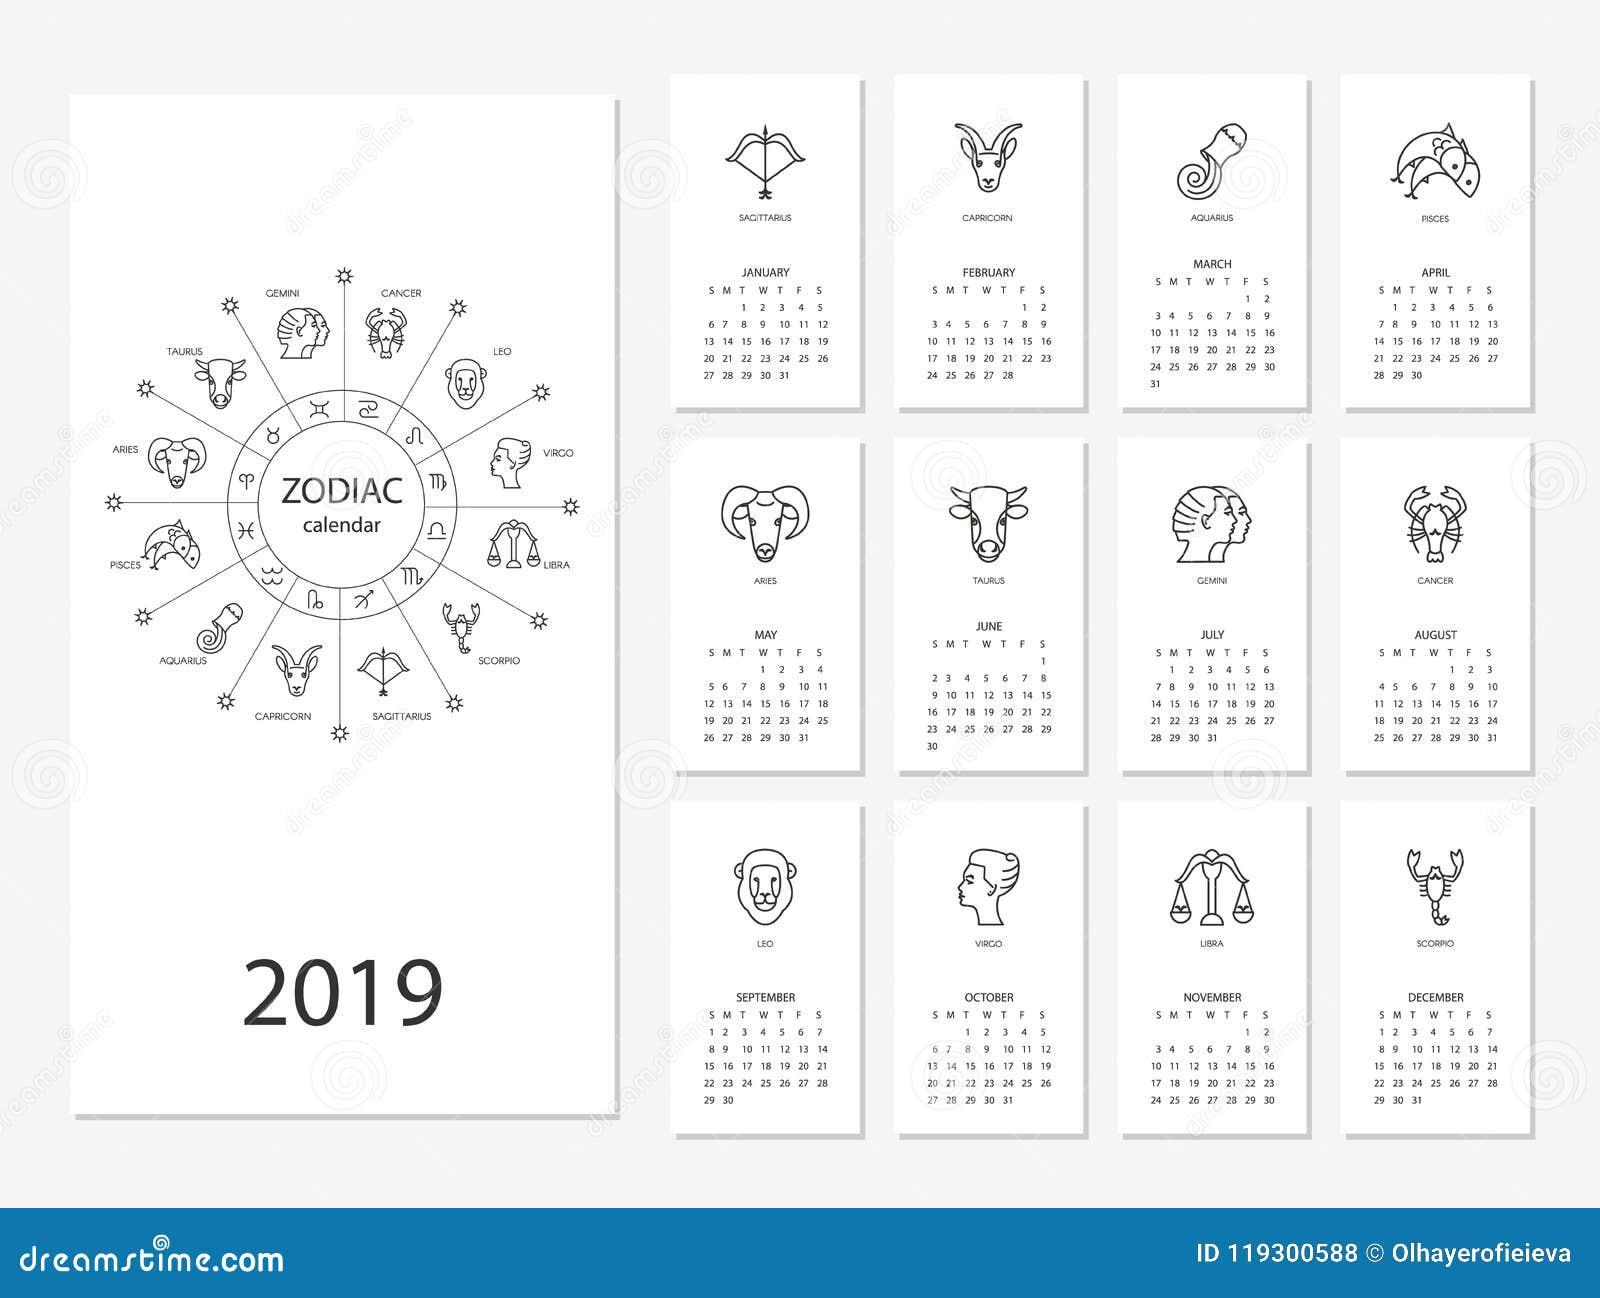 Horoscope Calendar 2019 2019 new year calendar stock vector. Illustration of template